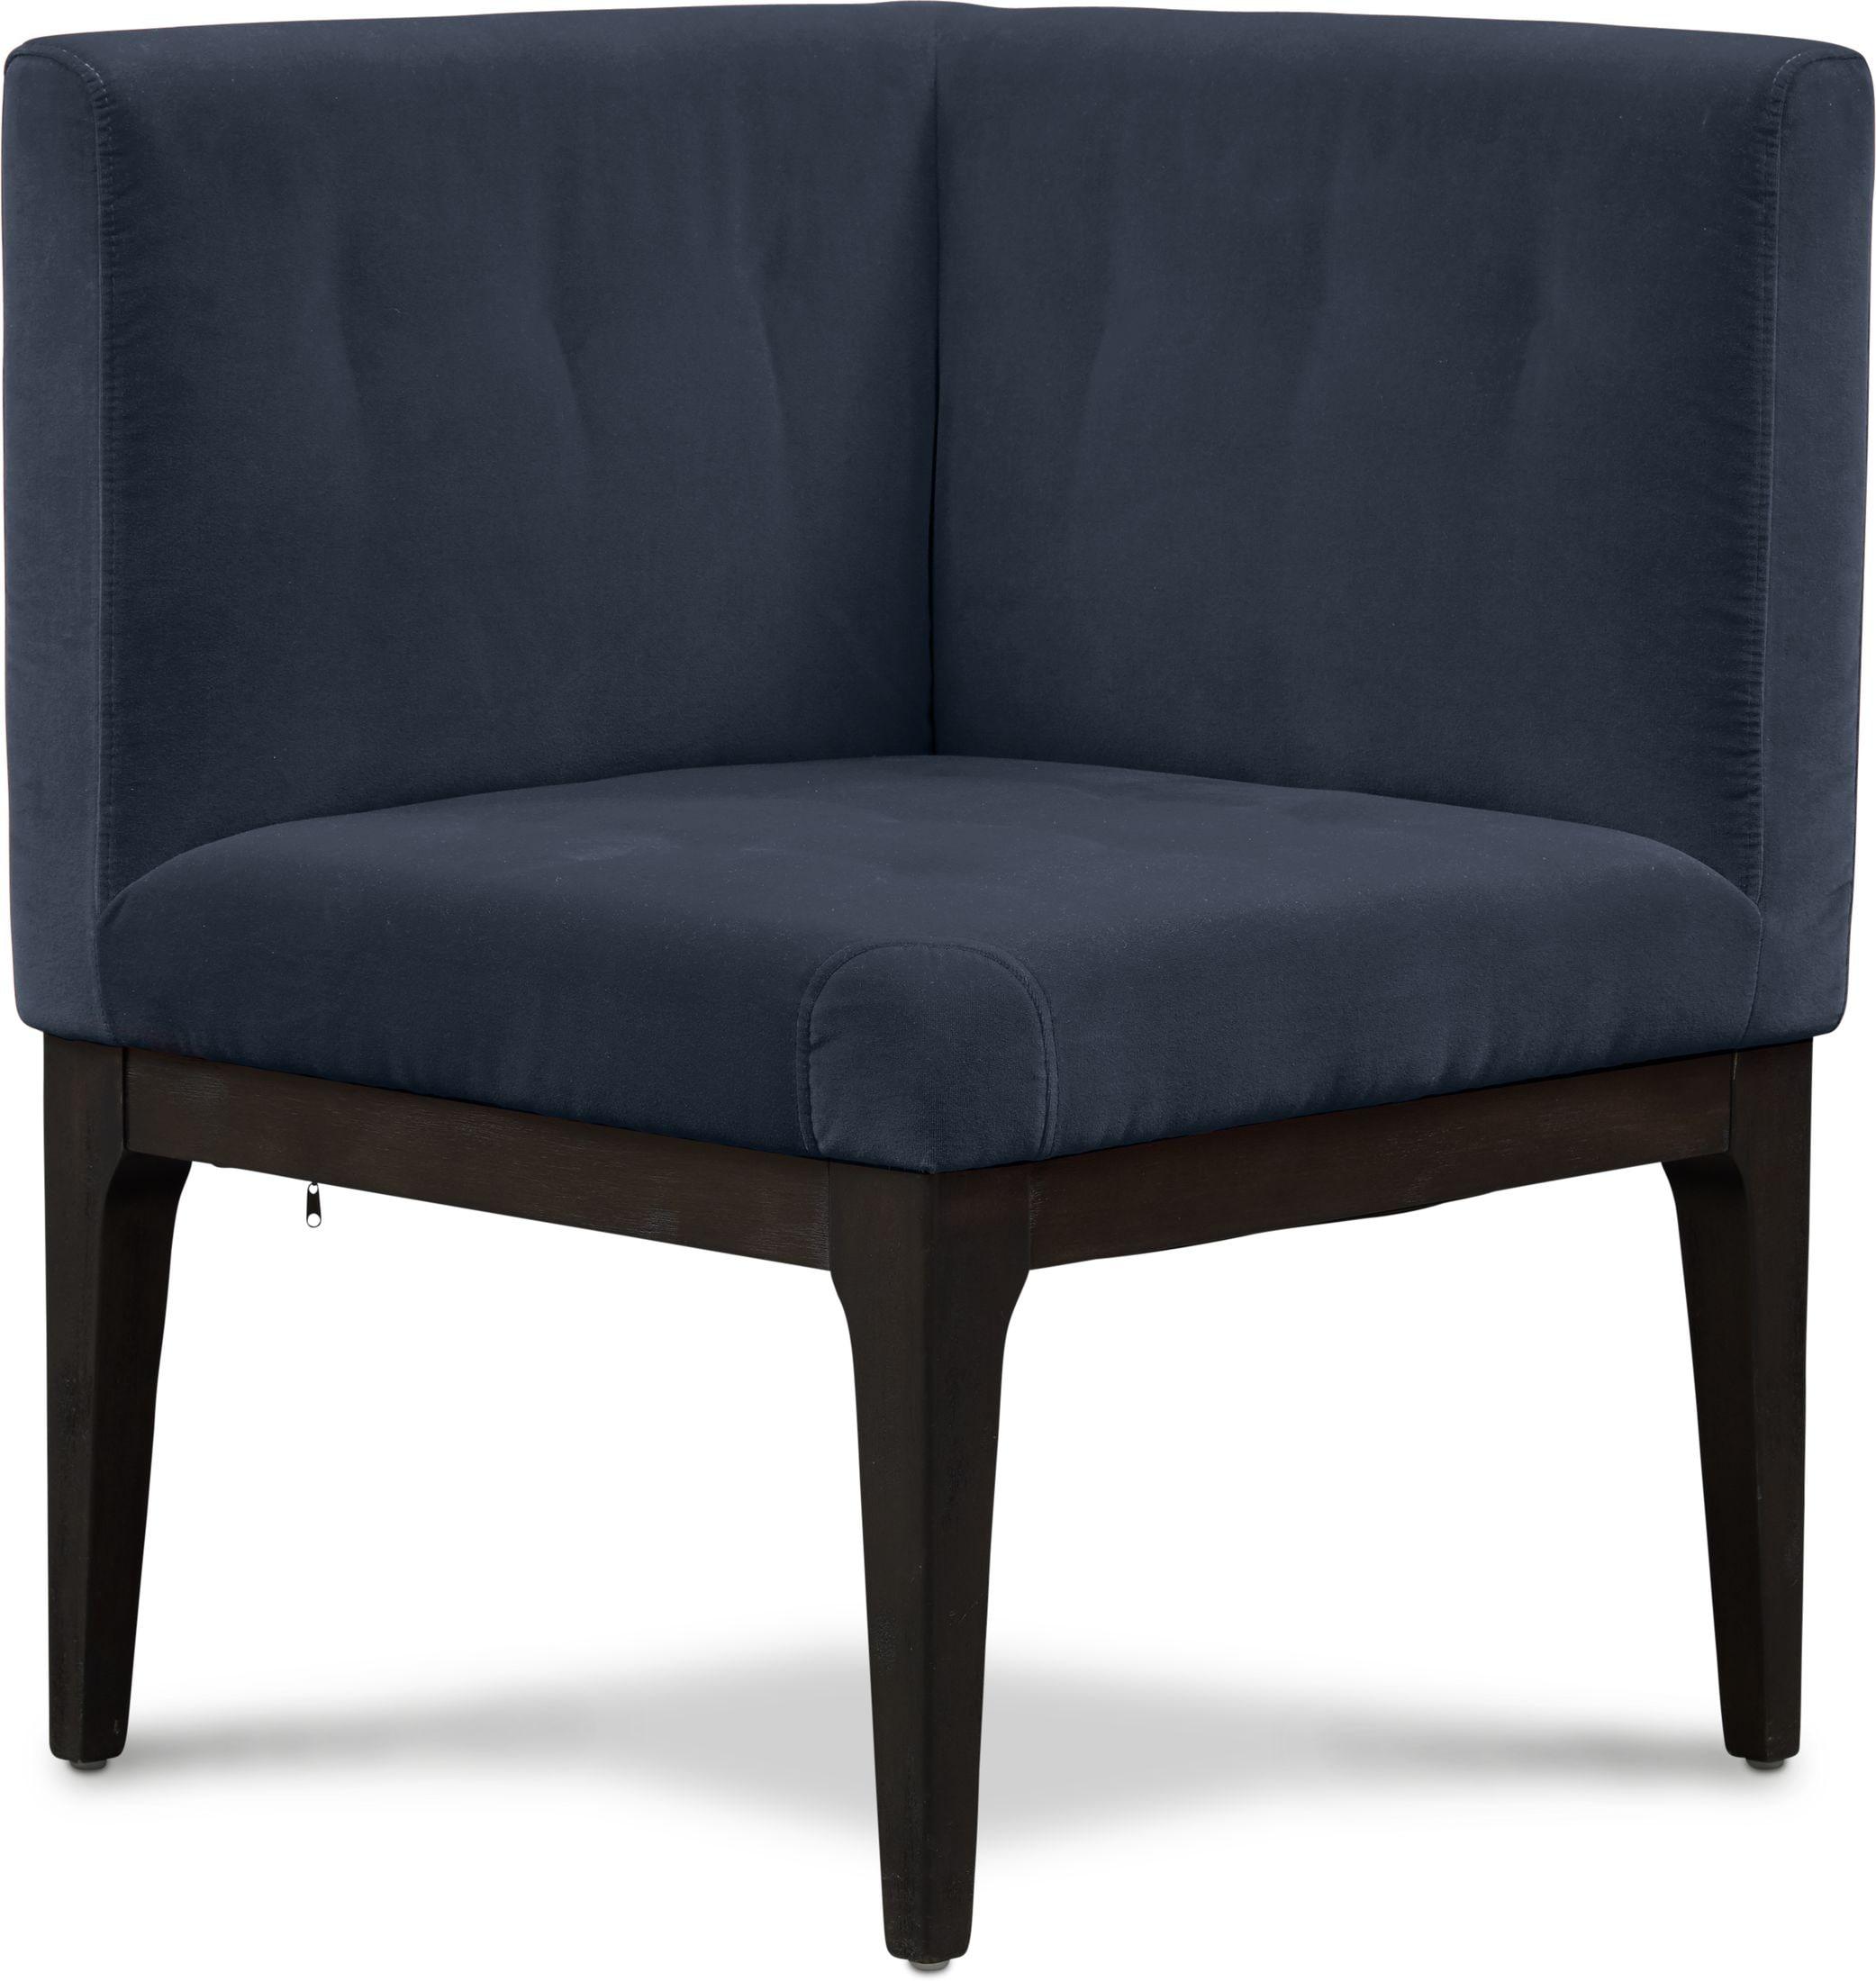 Dining Room Furniture - Artemis Corner Chair - Shadow